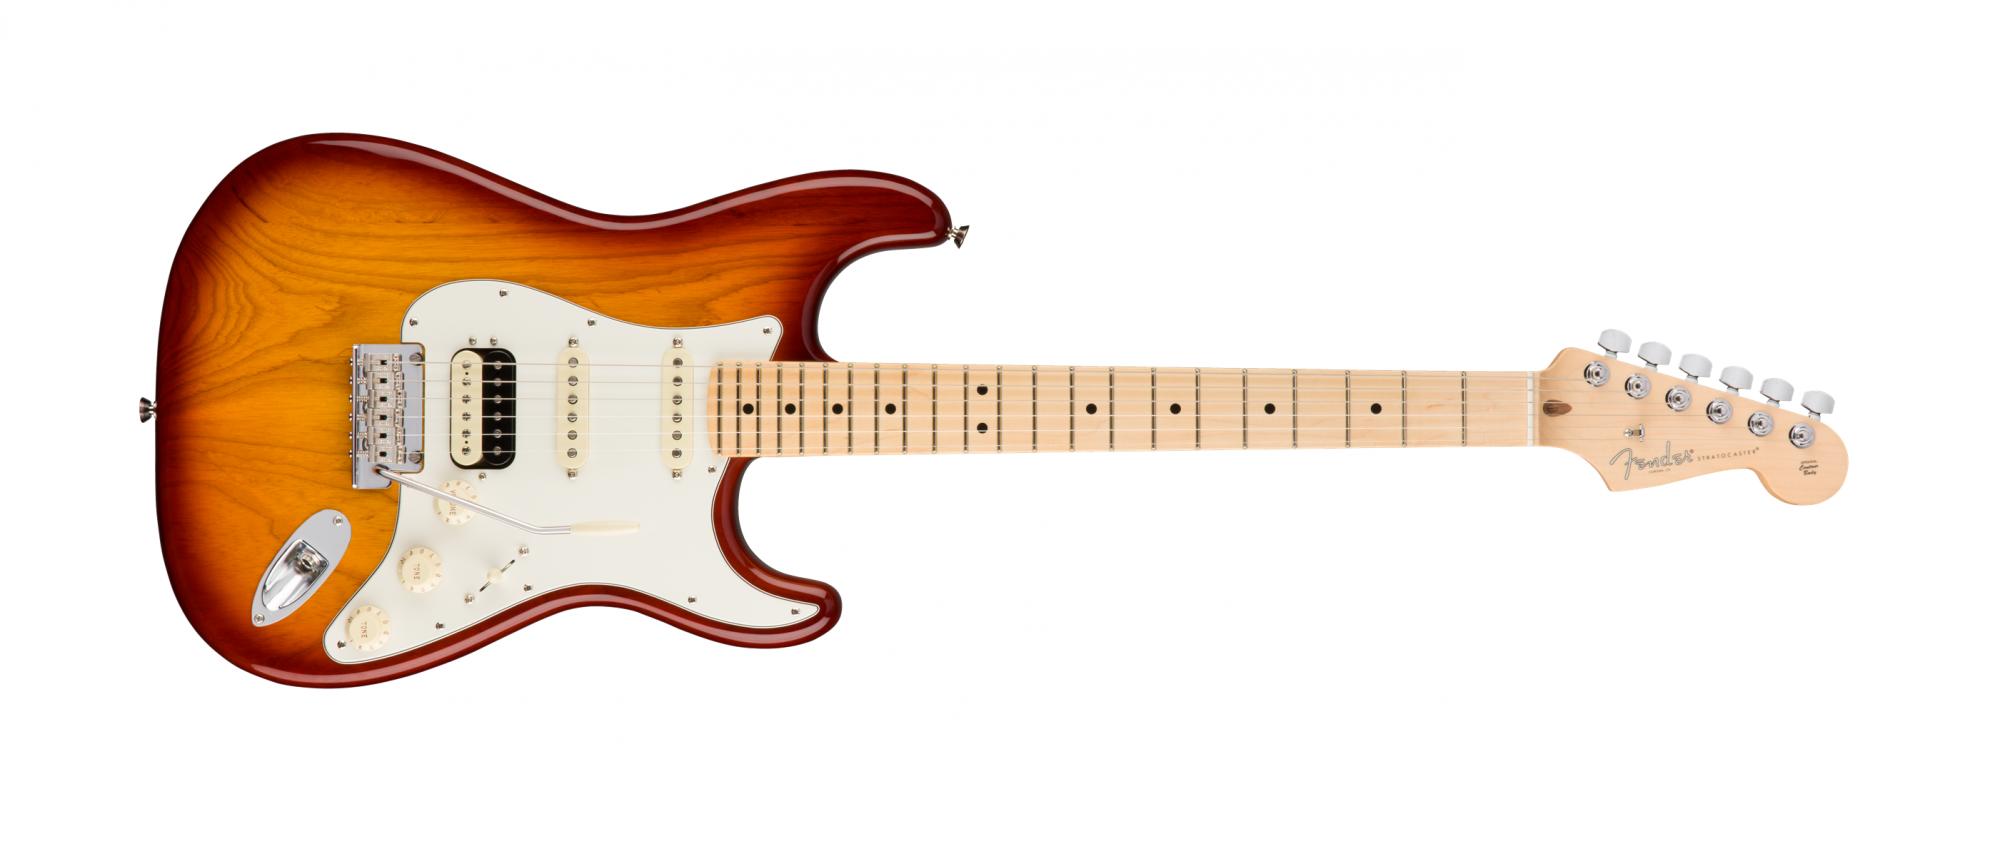 Fender American Pro Stratocaster HSS Maple Fingerboard, Sienna Sunburst